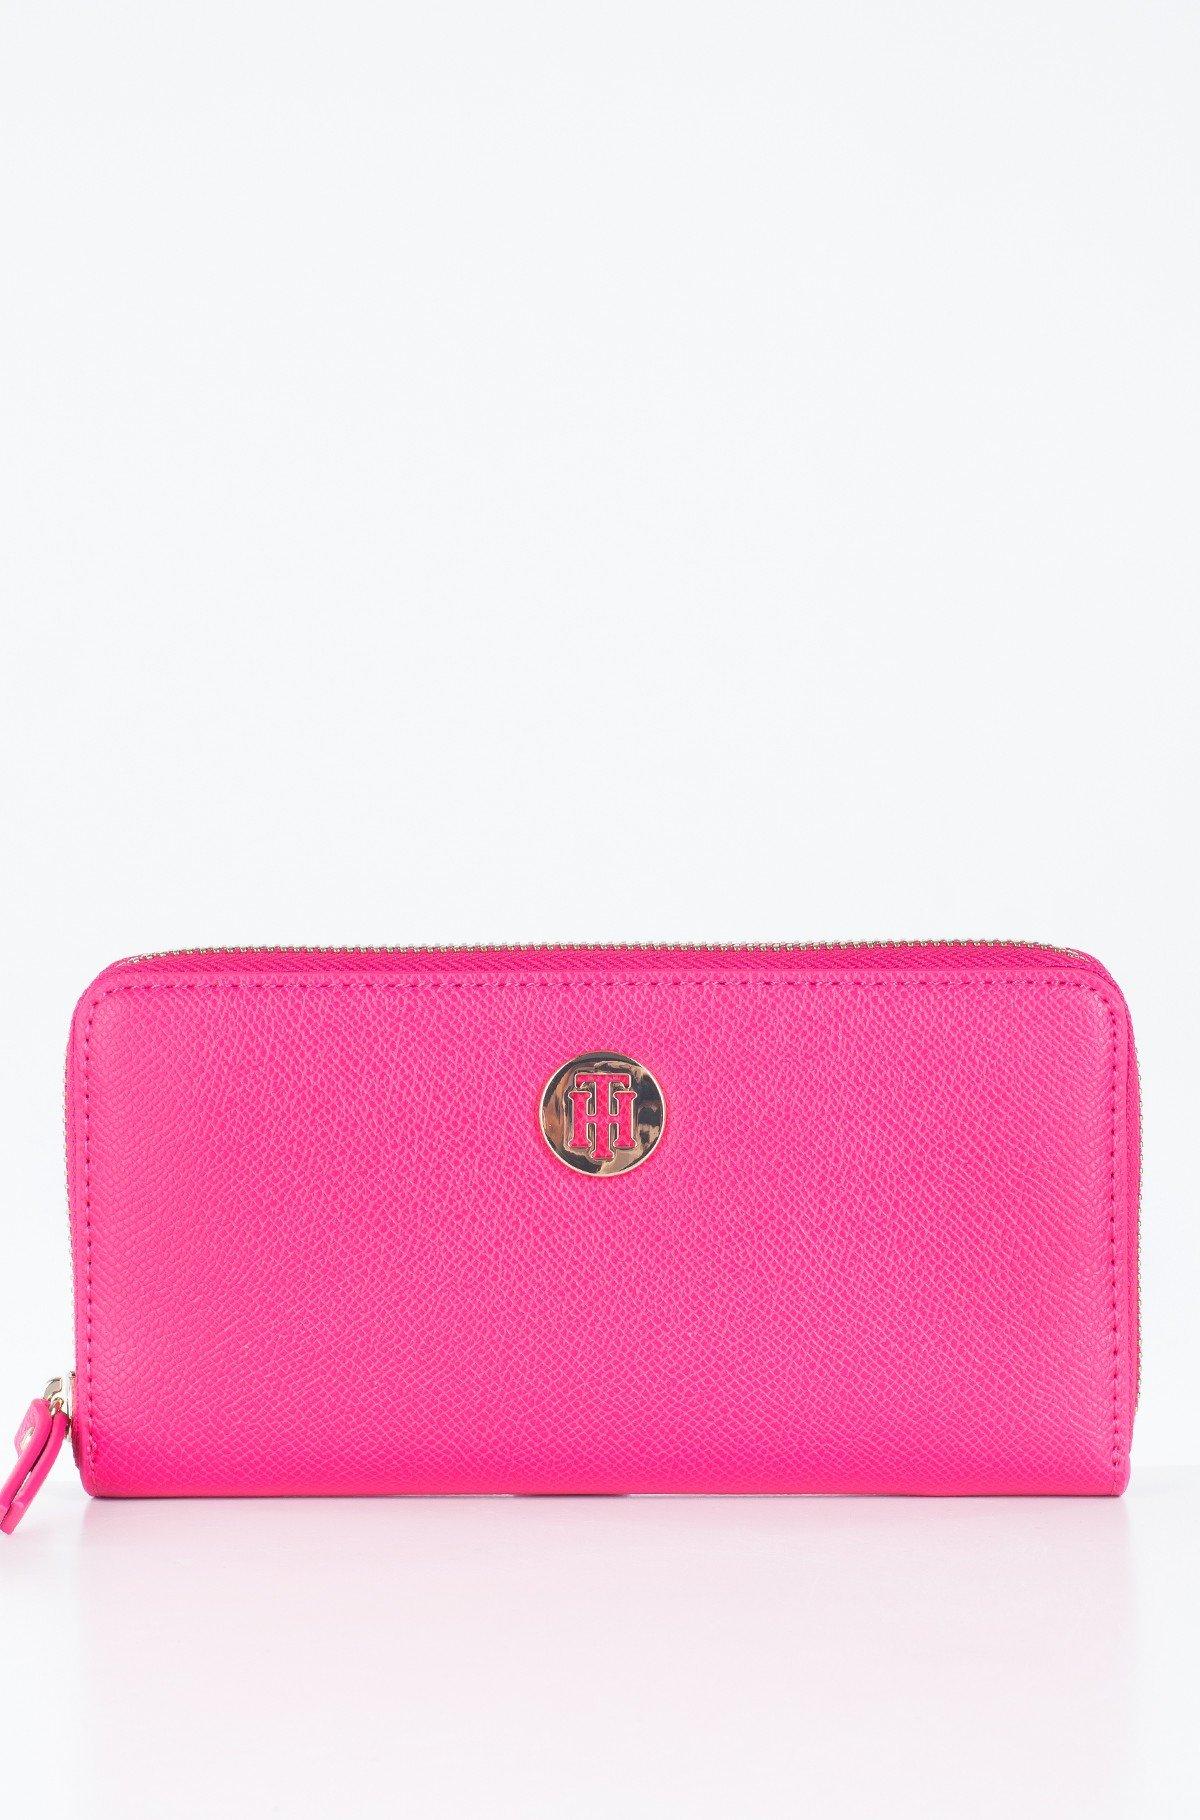 Wallet CLASSIC SAFFIANO LRG ZA WALLET-full-1